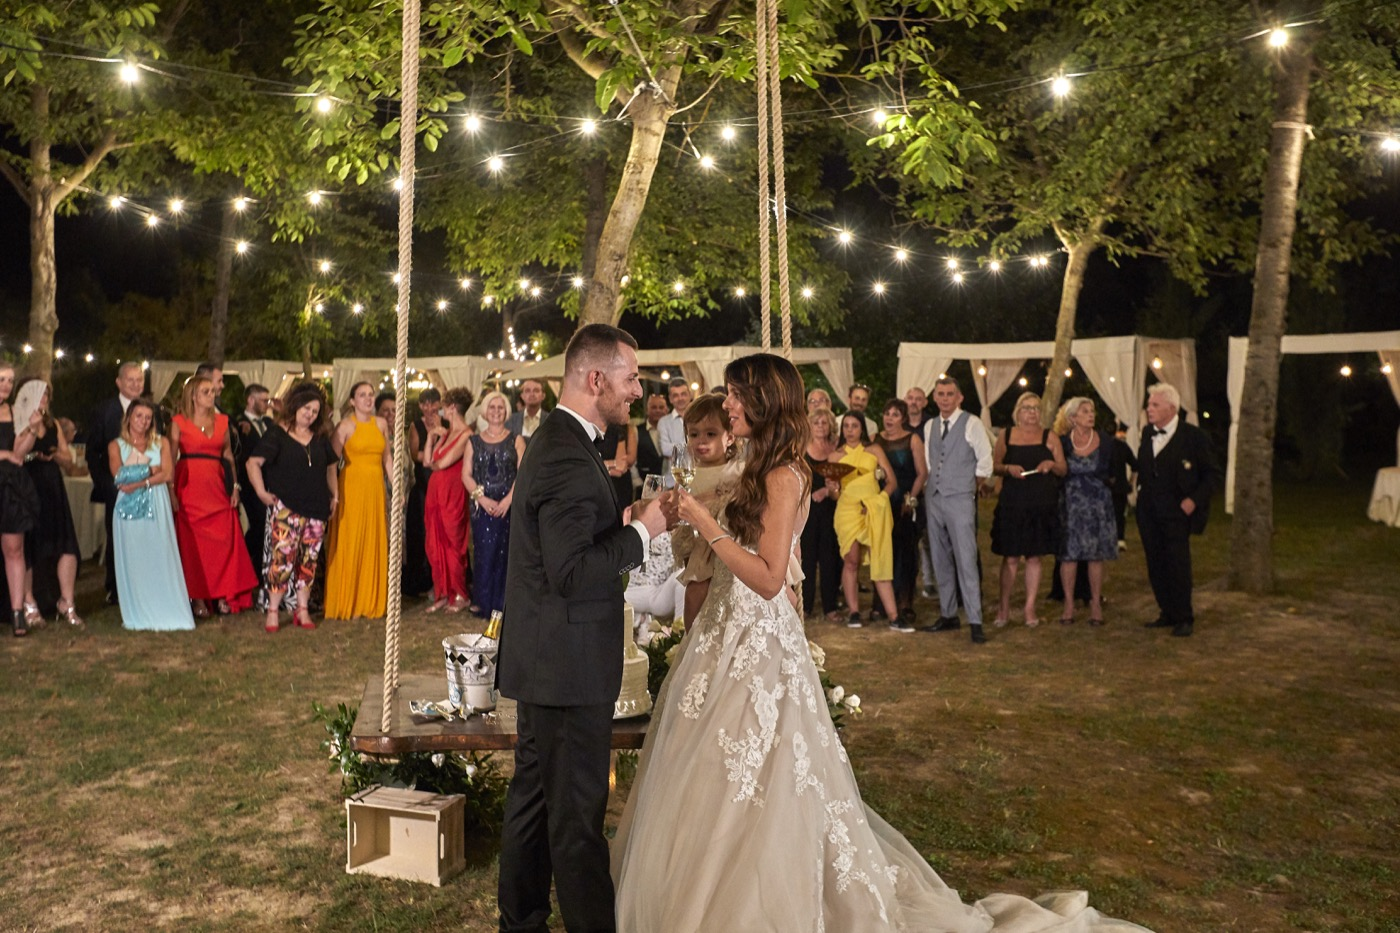 Claudio-Coppola-wedding-photographer-la-scuderia-eventi-preparativi-la-rosetta-perugia-95